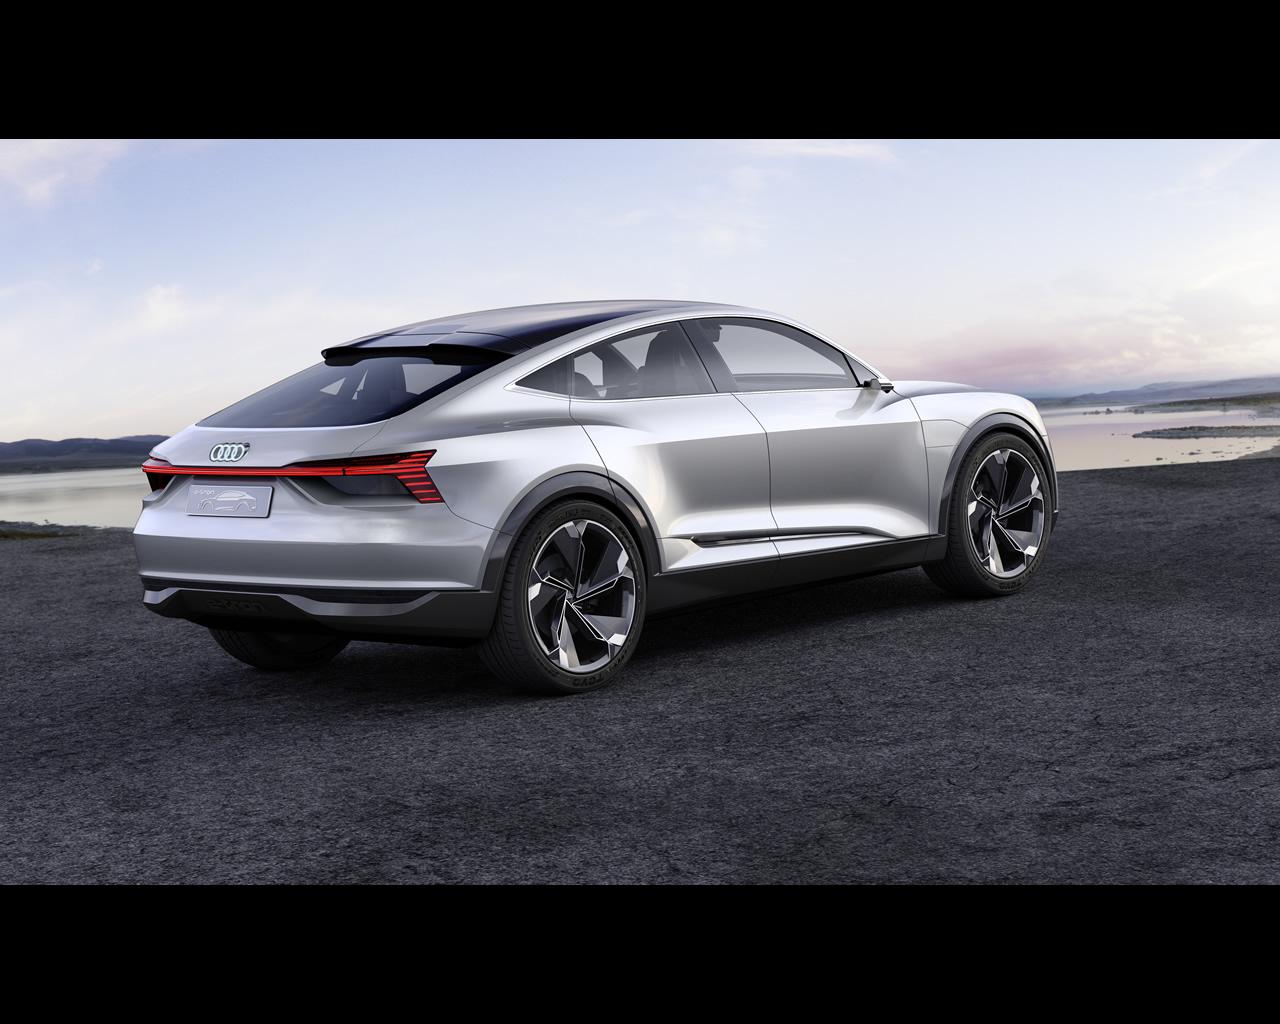 Audi E-tron Sportback Electric Concept Announced For